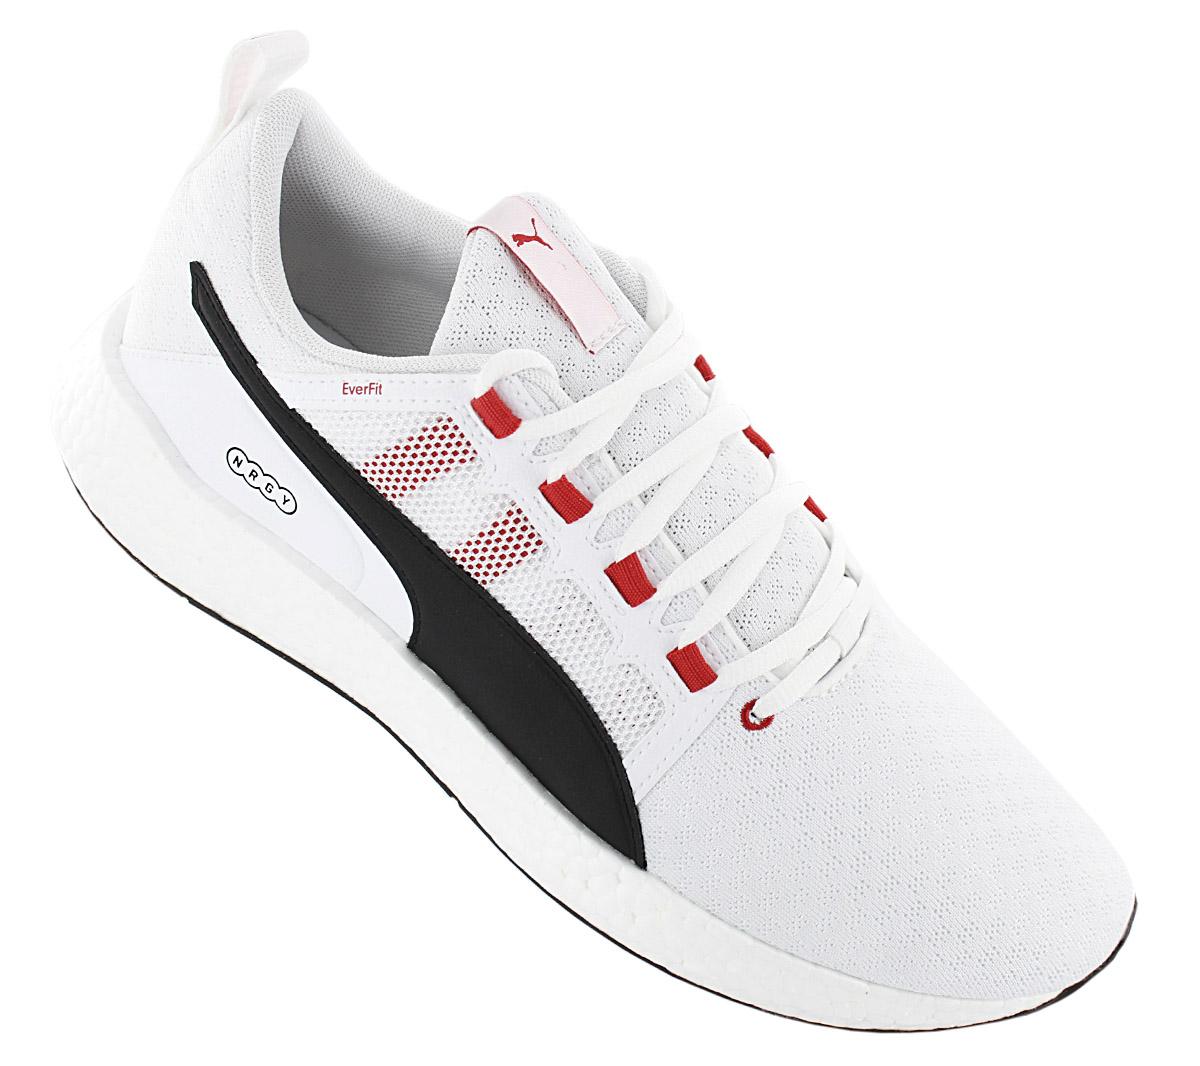 Details about Puma Nrgy Neko Turbo Men's Sneaker 192520-04 White Shoes  Sport Shoes Trainers